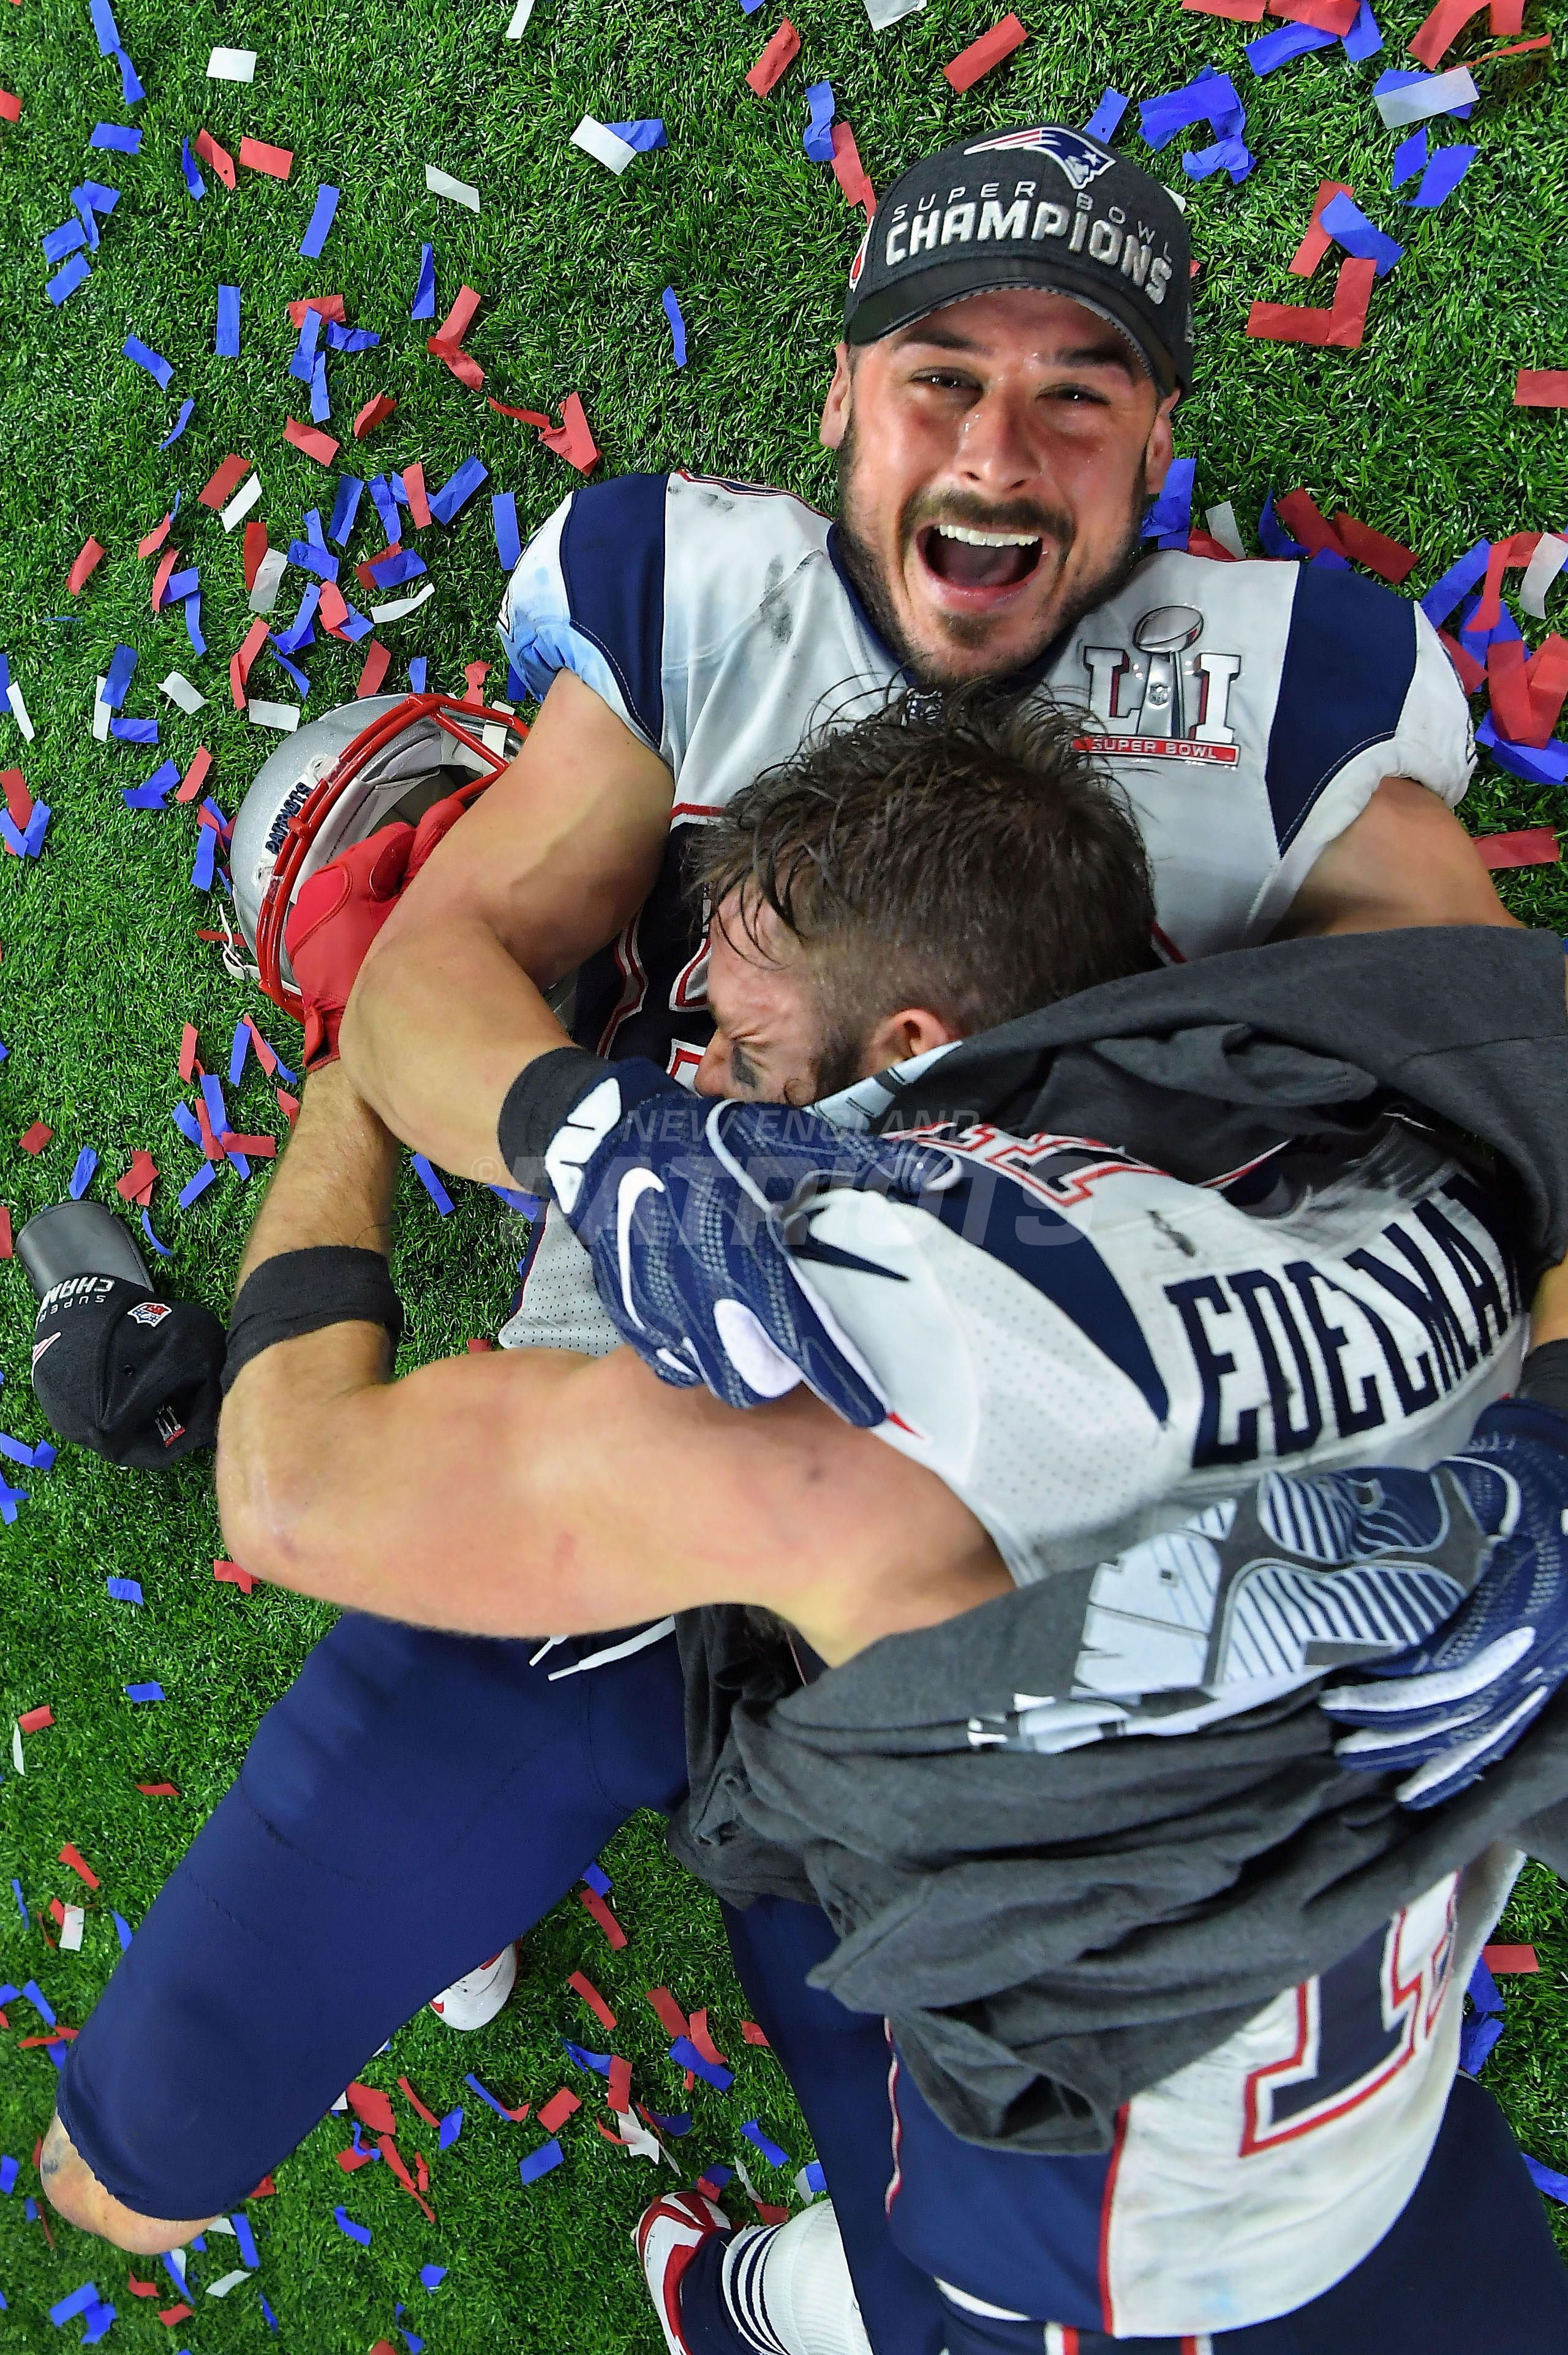 Nordstrom S Best Presented By Carmax Super Bowl Li Patriots Falcons 2 5 New England Patriots New England Patriots Football Patriots